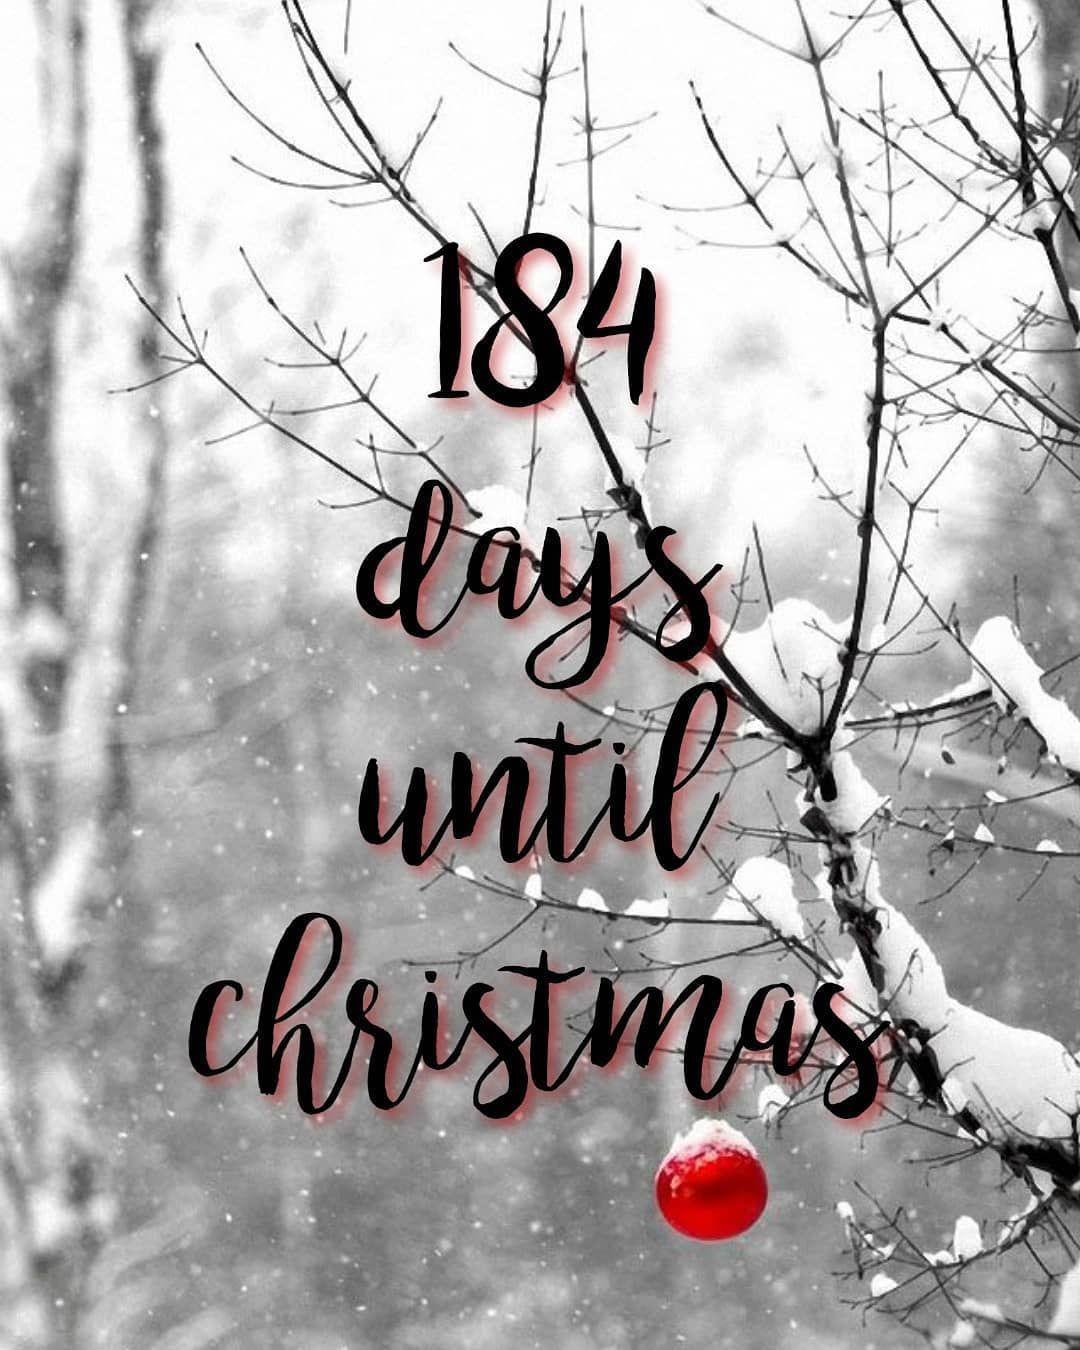 "Christmassgram on Instagram: ""🦌🎄🤶❄🎅🎁⛄ #christmas #xmas #winter #hotchocolate #marshmallow #christmasgram #christmastree #christmastime #christmasmood #christmasspirit…"""